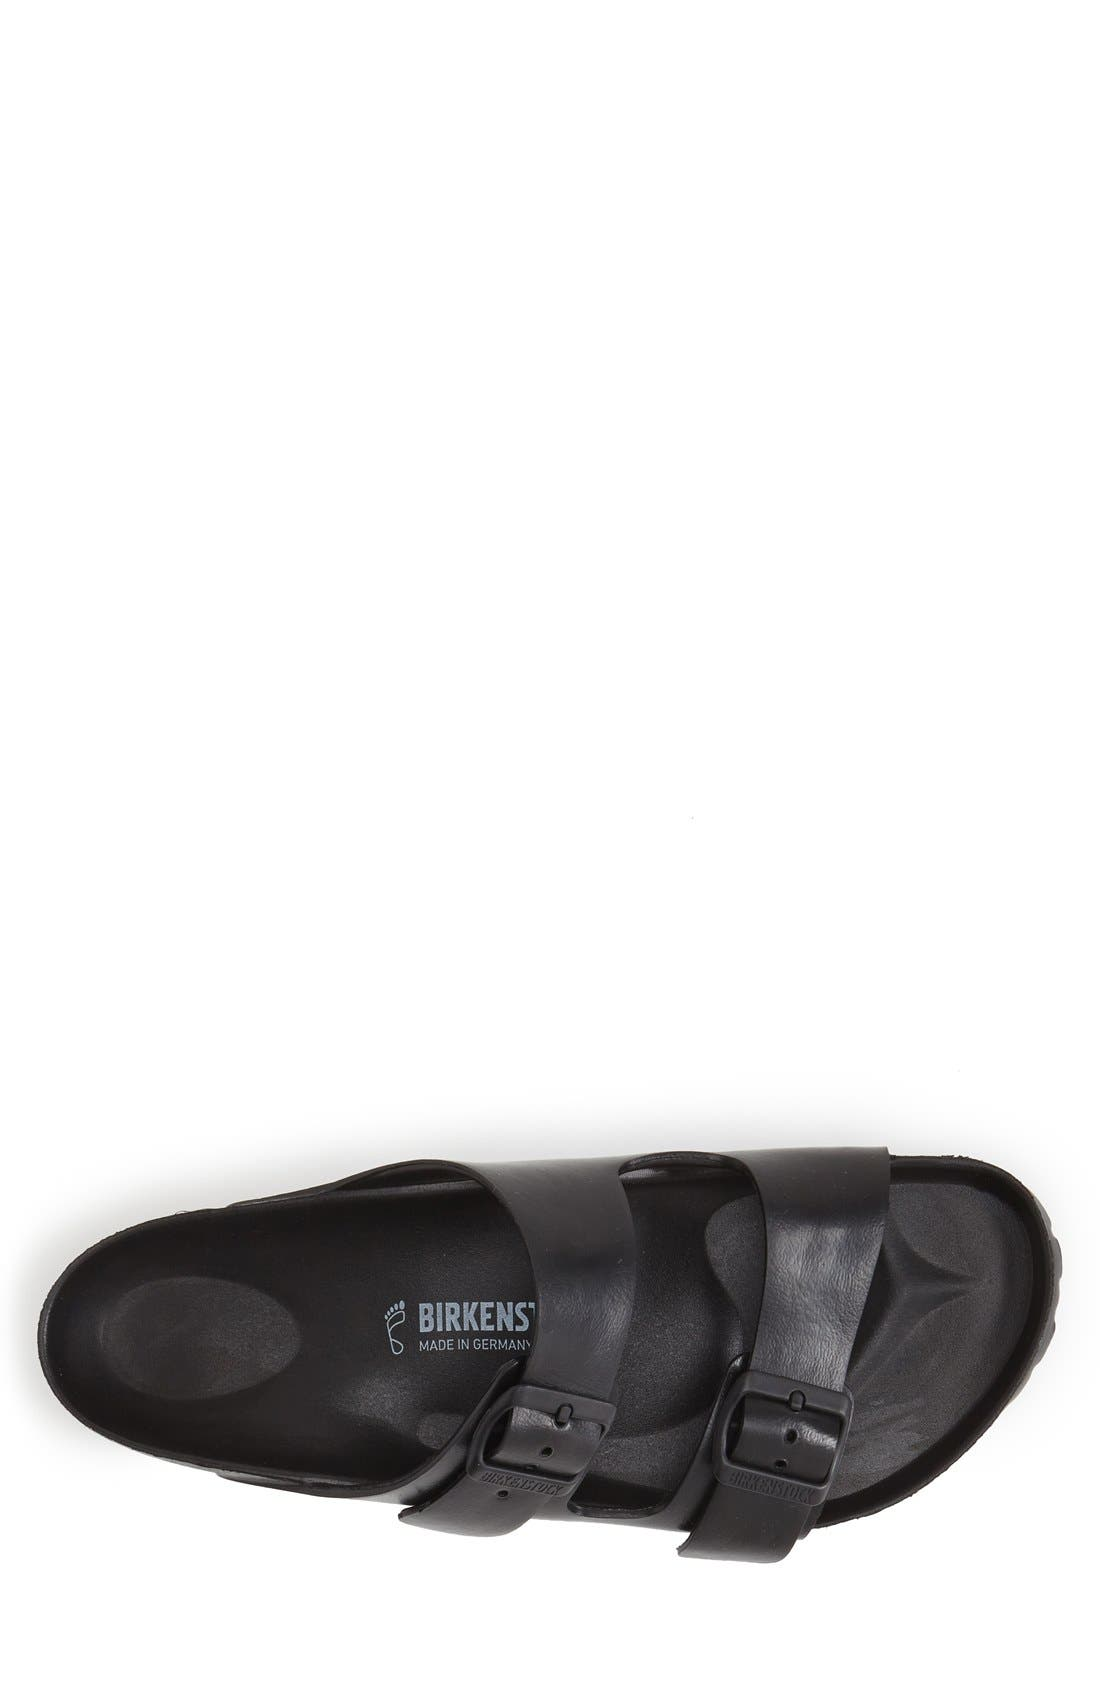 'Essentials - Arizona EVA' Waterproof Slide Sandal,                             Alternate thumbnail 3, color,                             BLACK